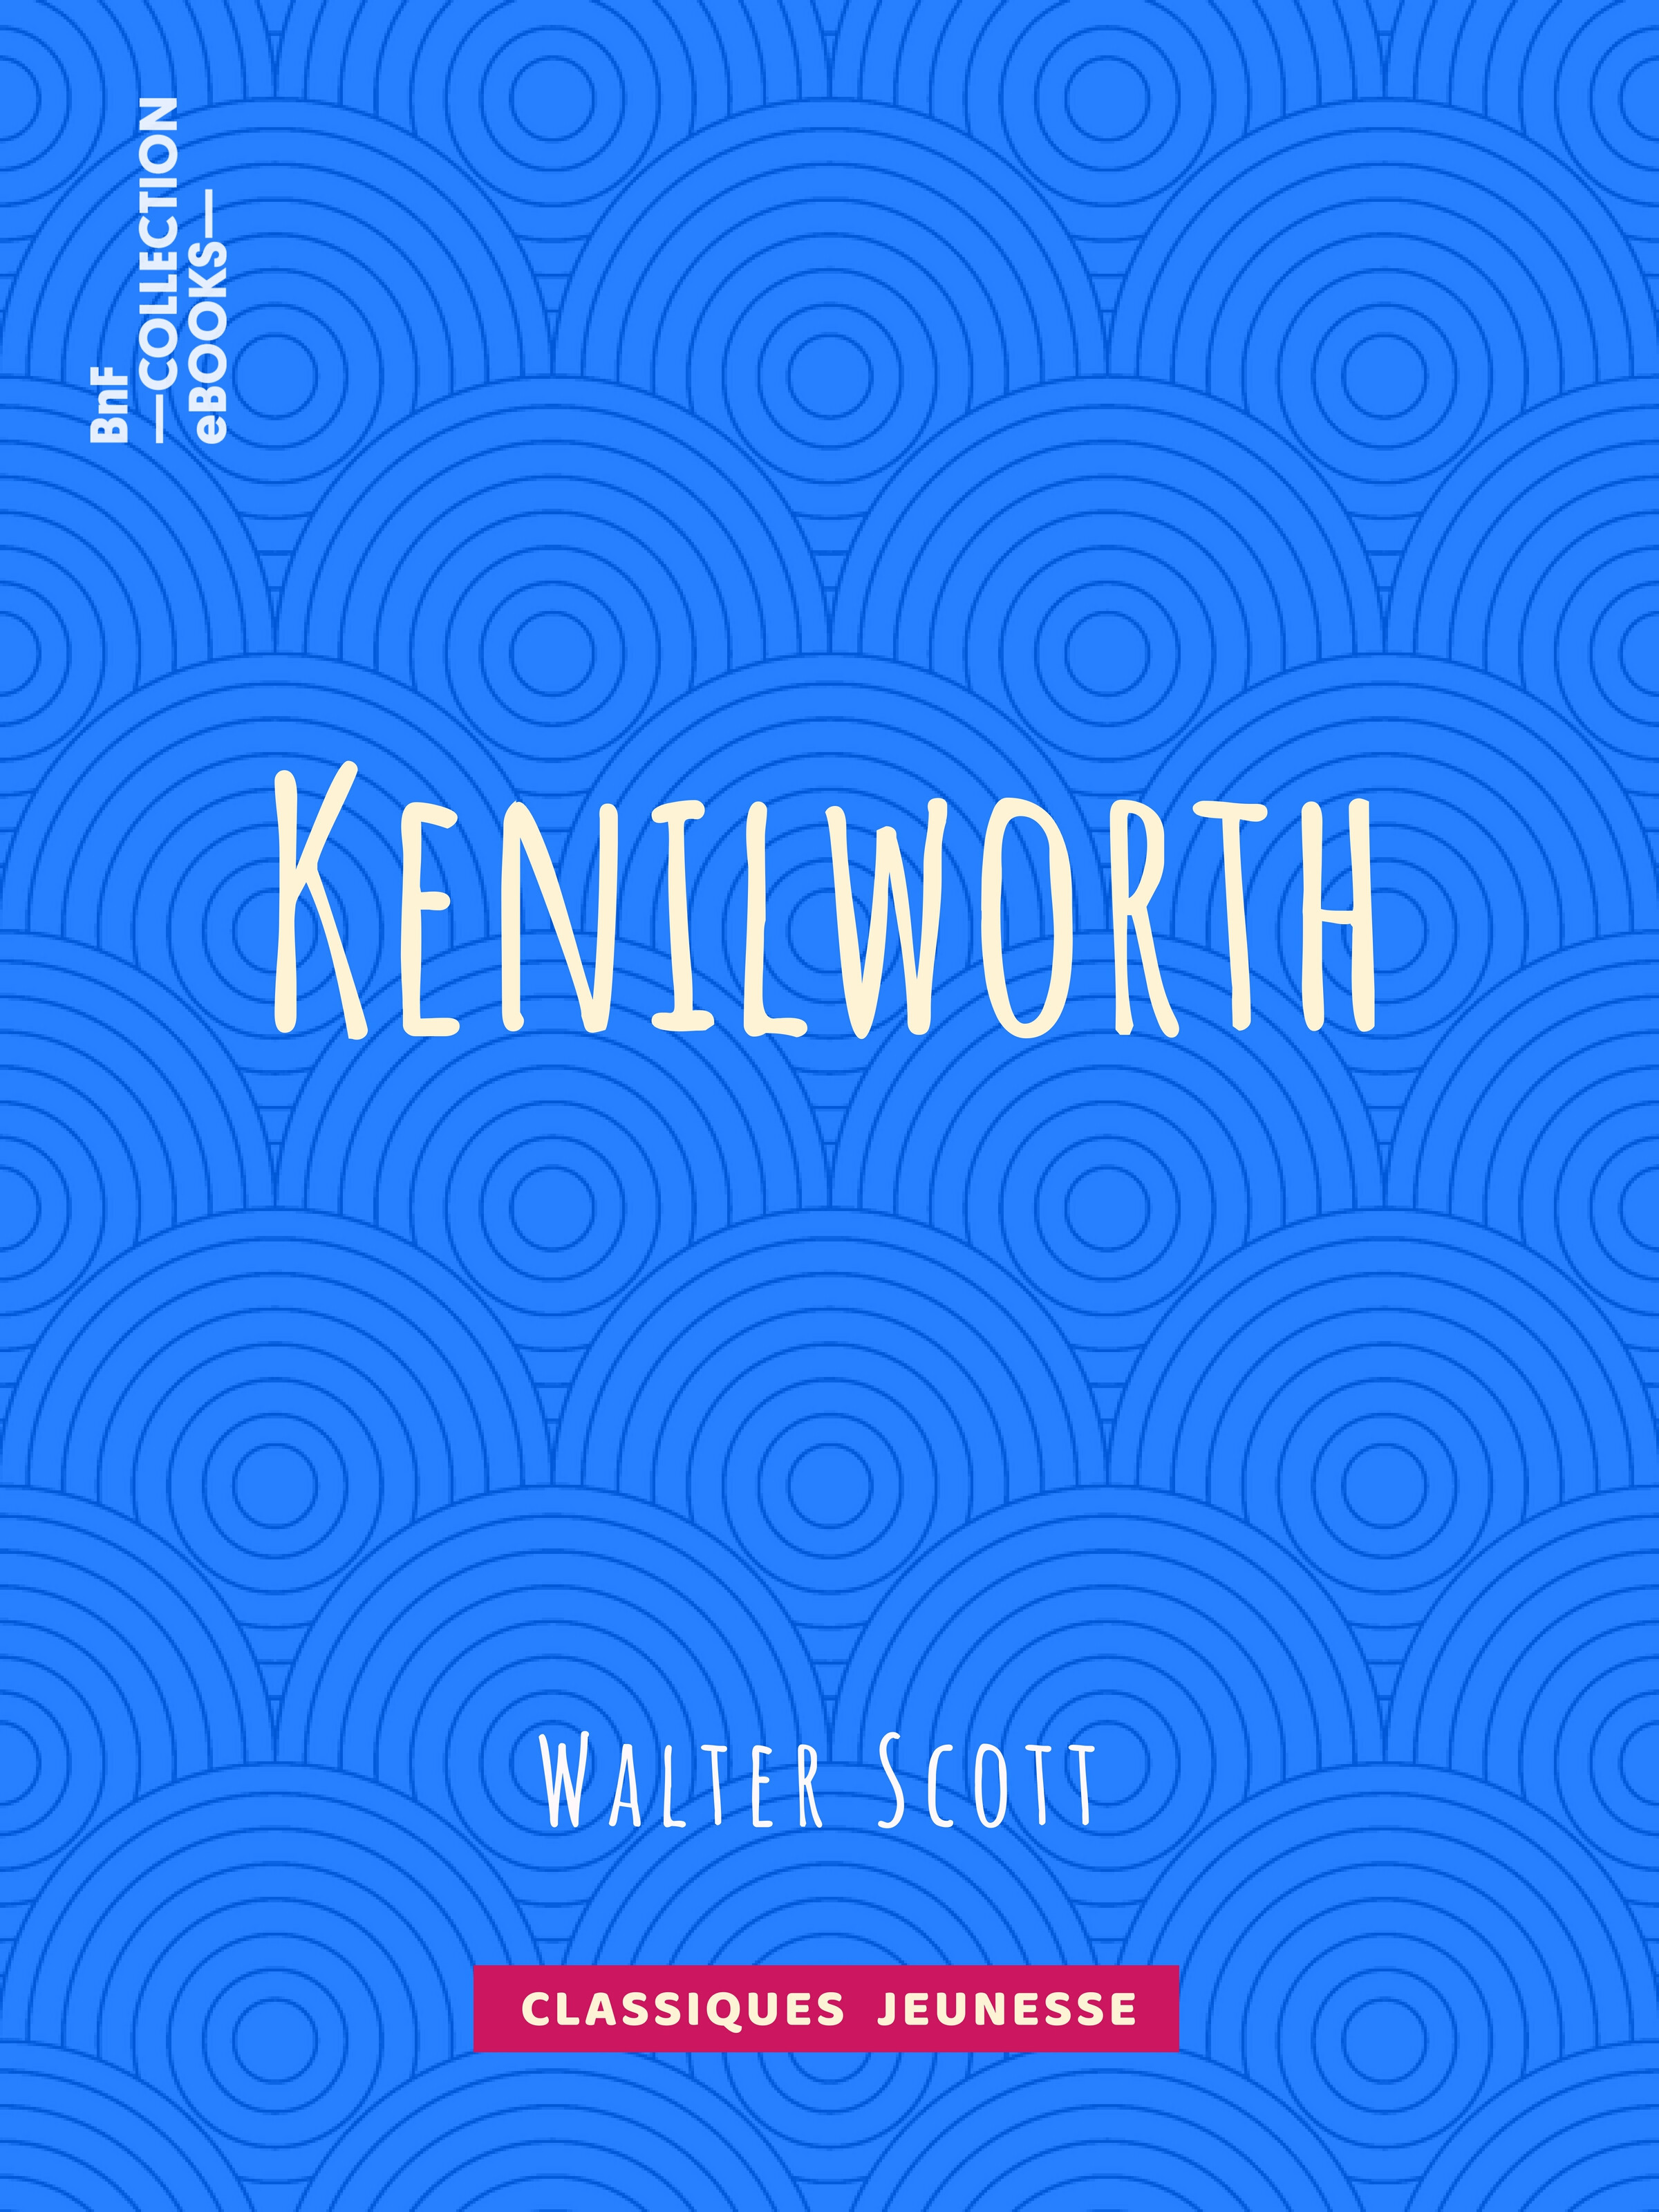 Kenilworth  - Auguste-Jean-Baptiste Defauconpret